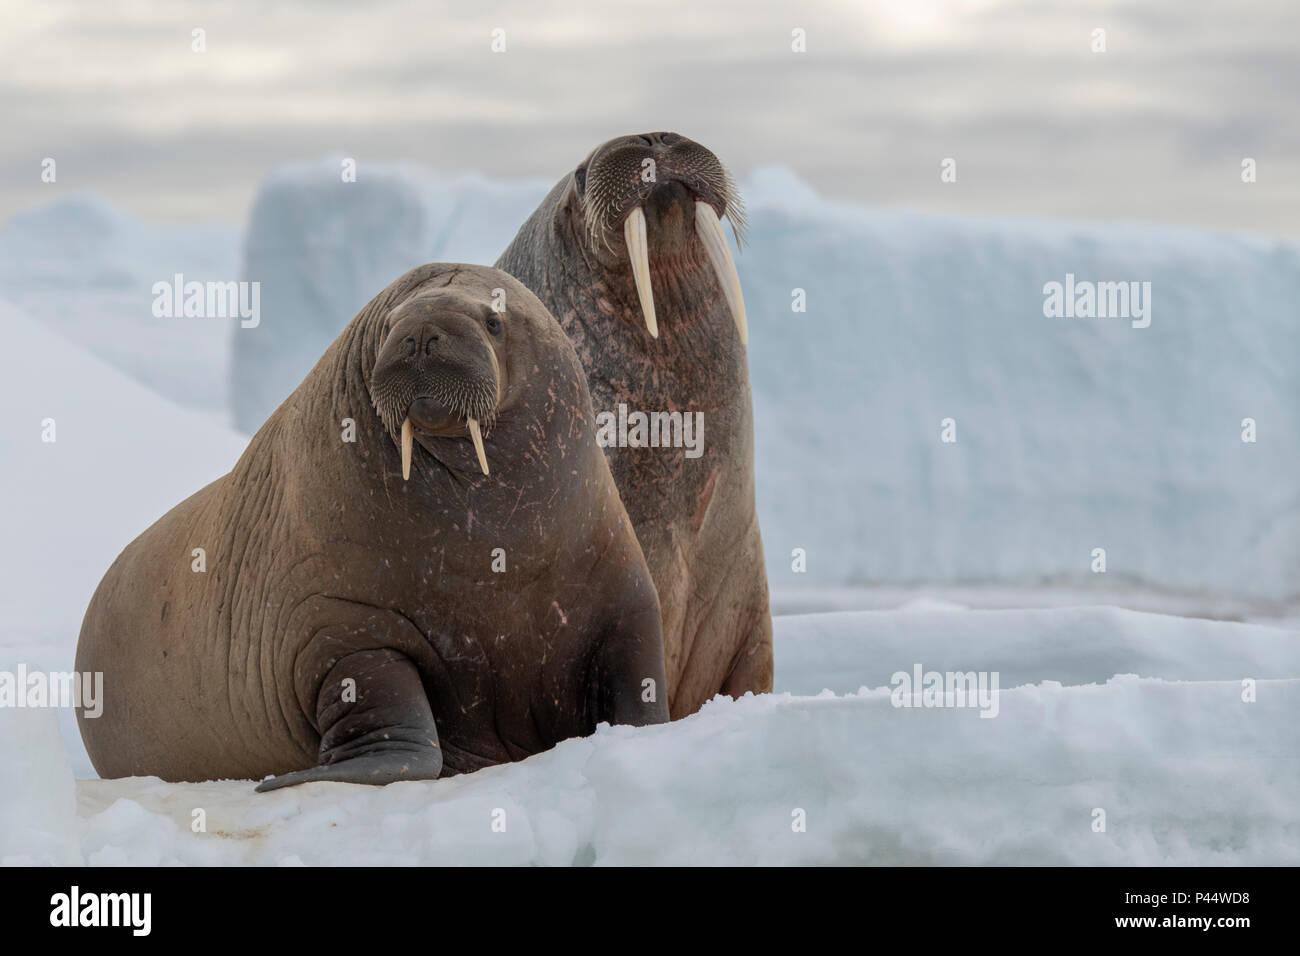 La Norvège, Svalbard, Nordaustlandet, Austfonna. Le morse (Odobenus rosmarus) avec Austfonna Ice Cap dans la distance. Photo Stock